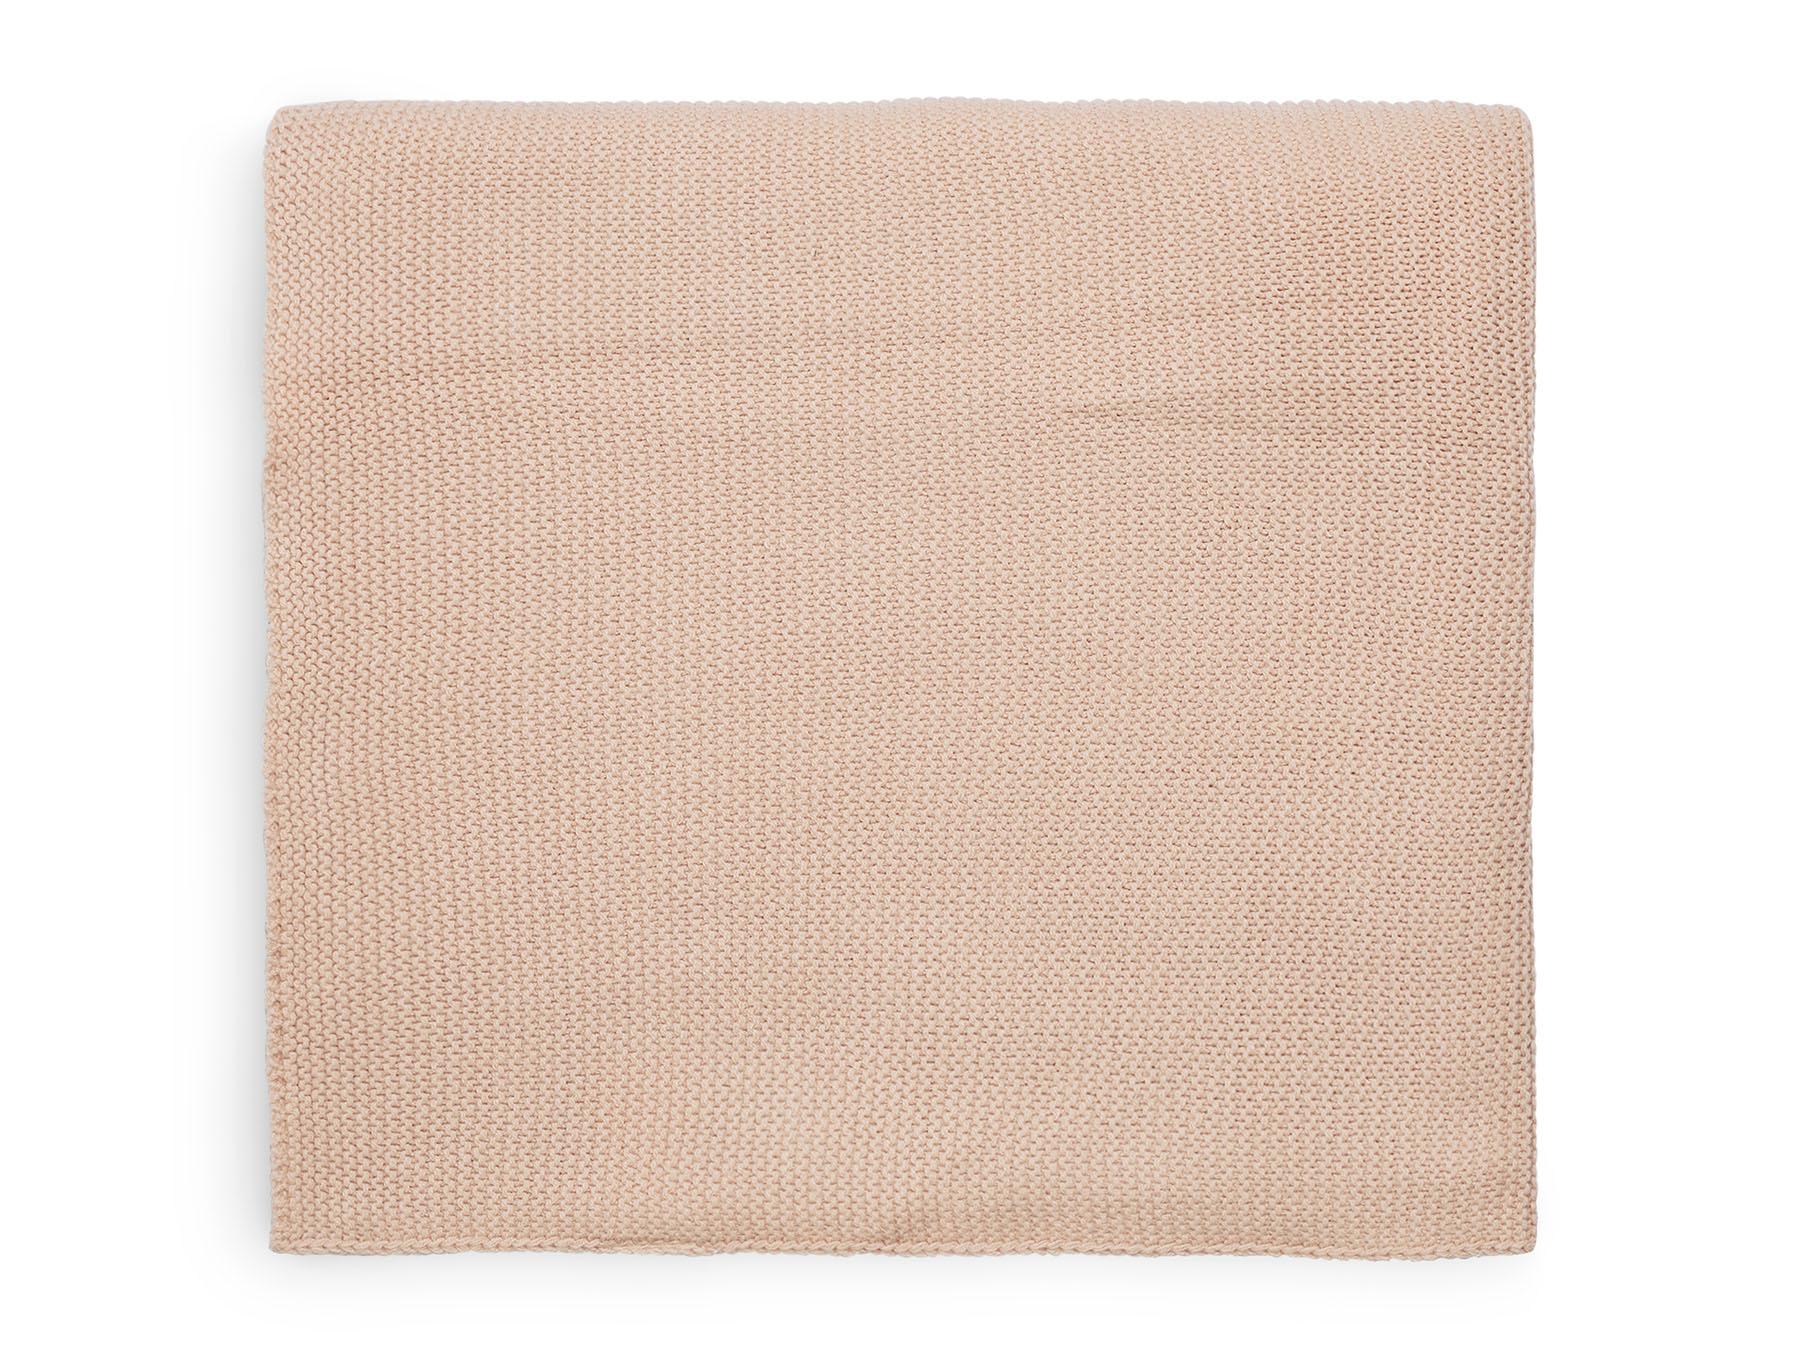 Babydecke Strickdecke Basic Knit rosa (75x100 cm)